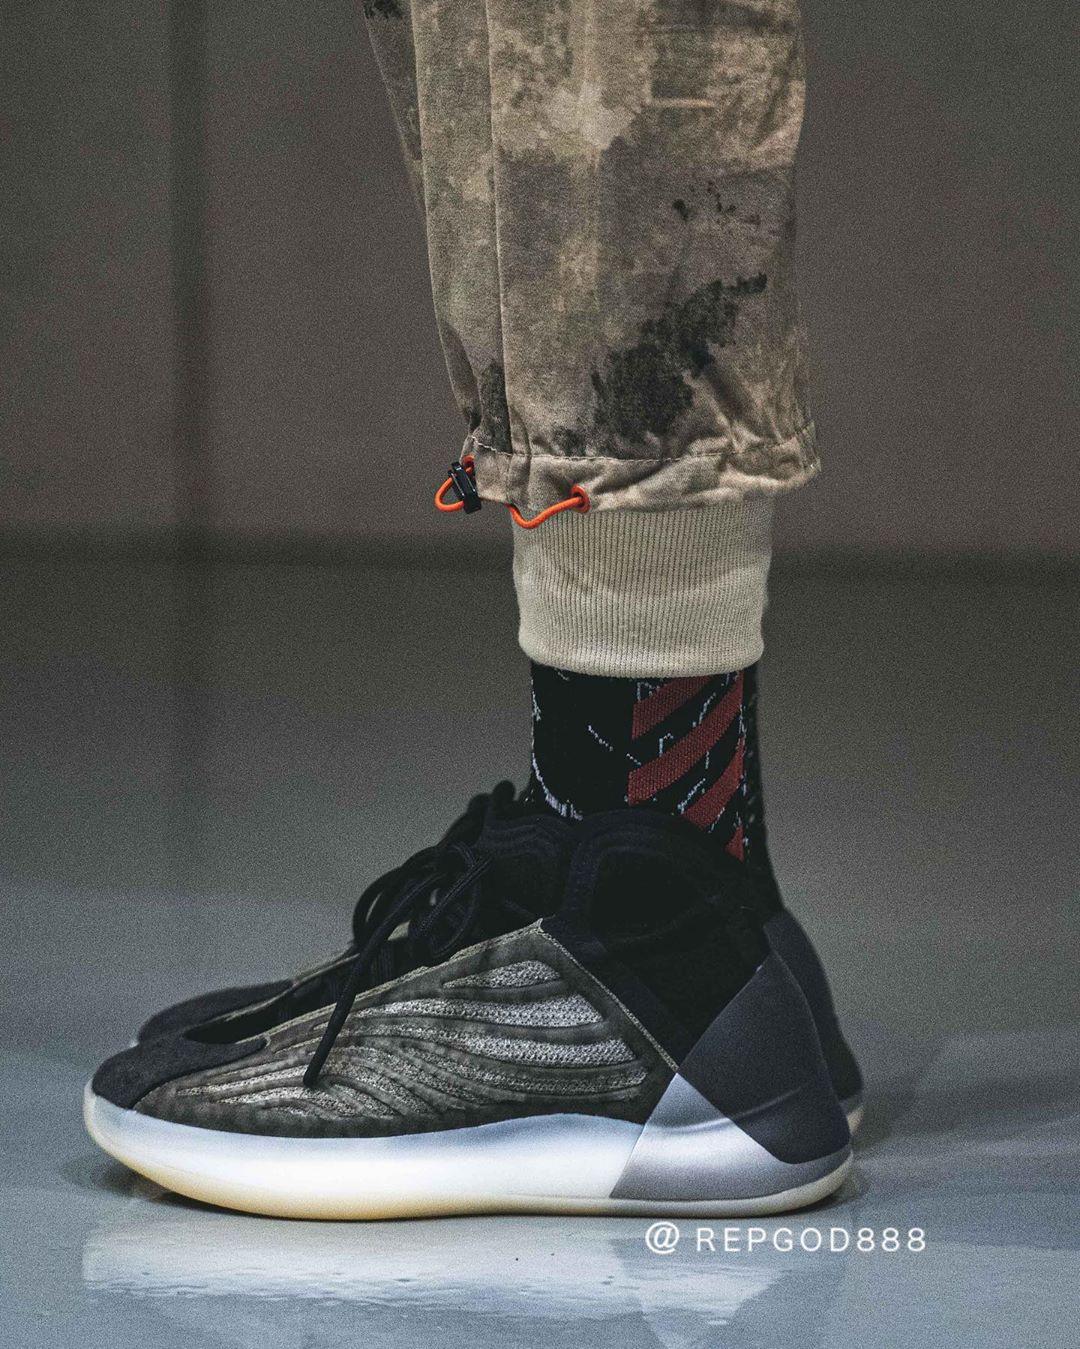 adidas,Yeezy Quantum,H68771,发售  全新 Yeezy 篮球鞋上脚真的帅!还有满天星鞋身!